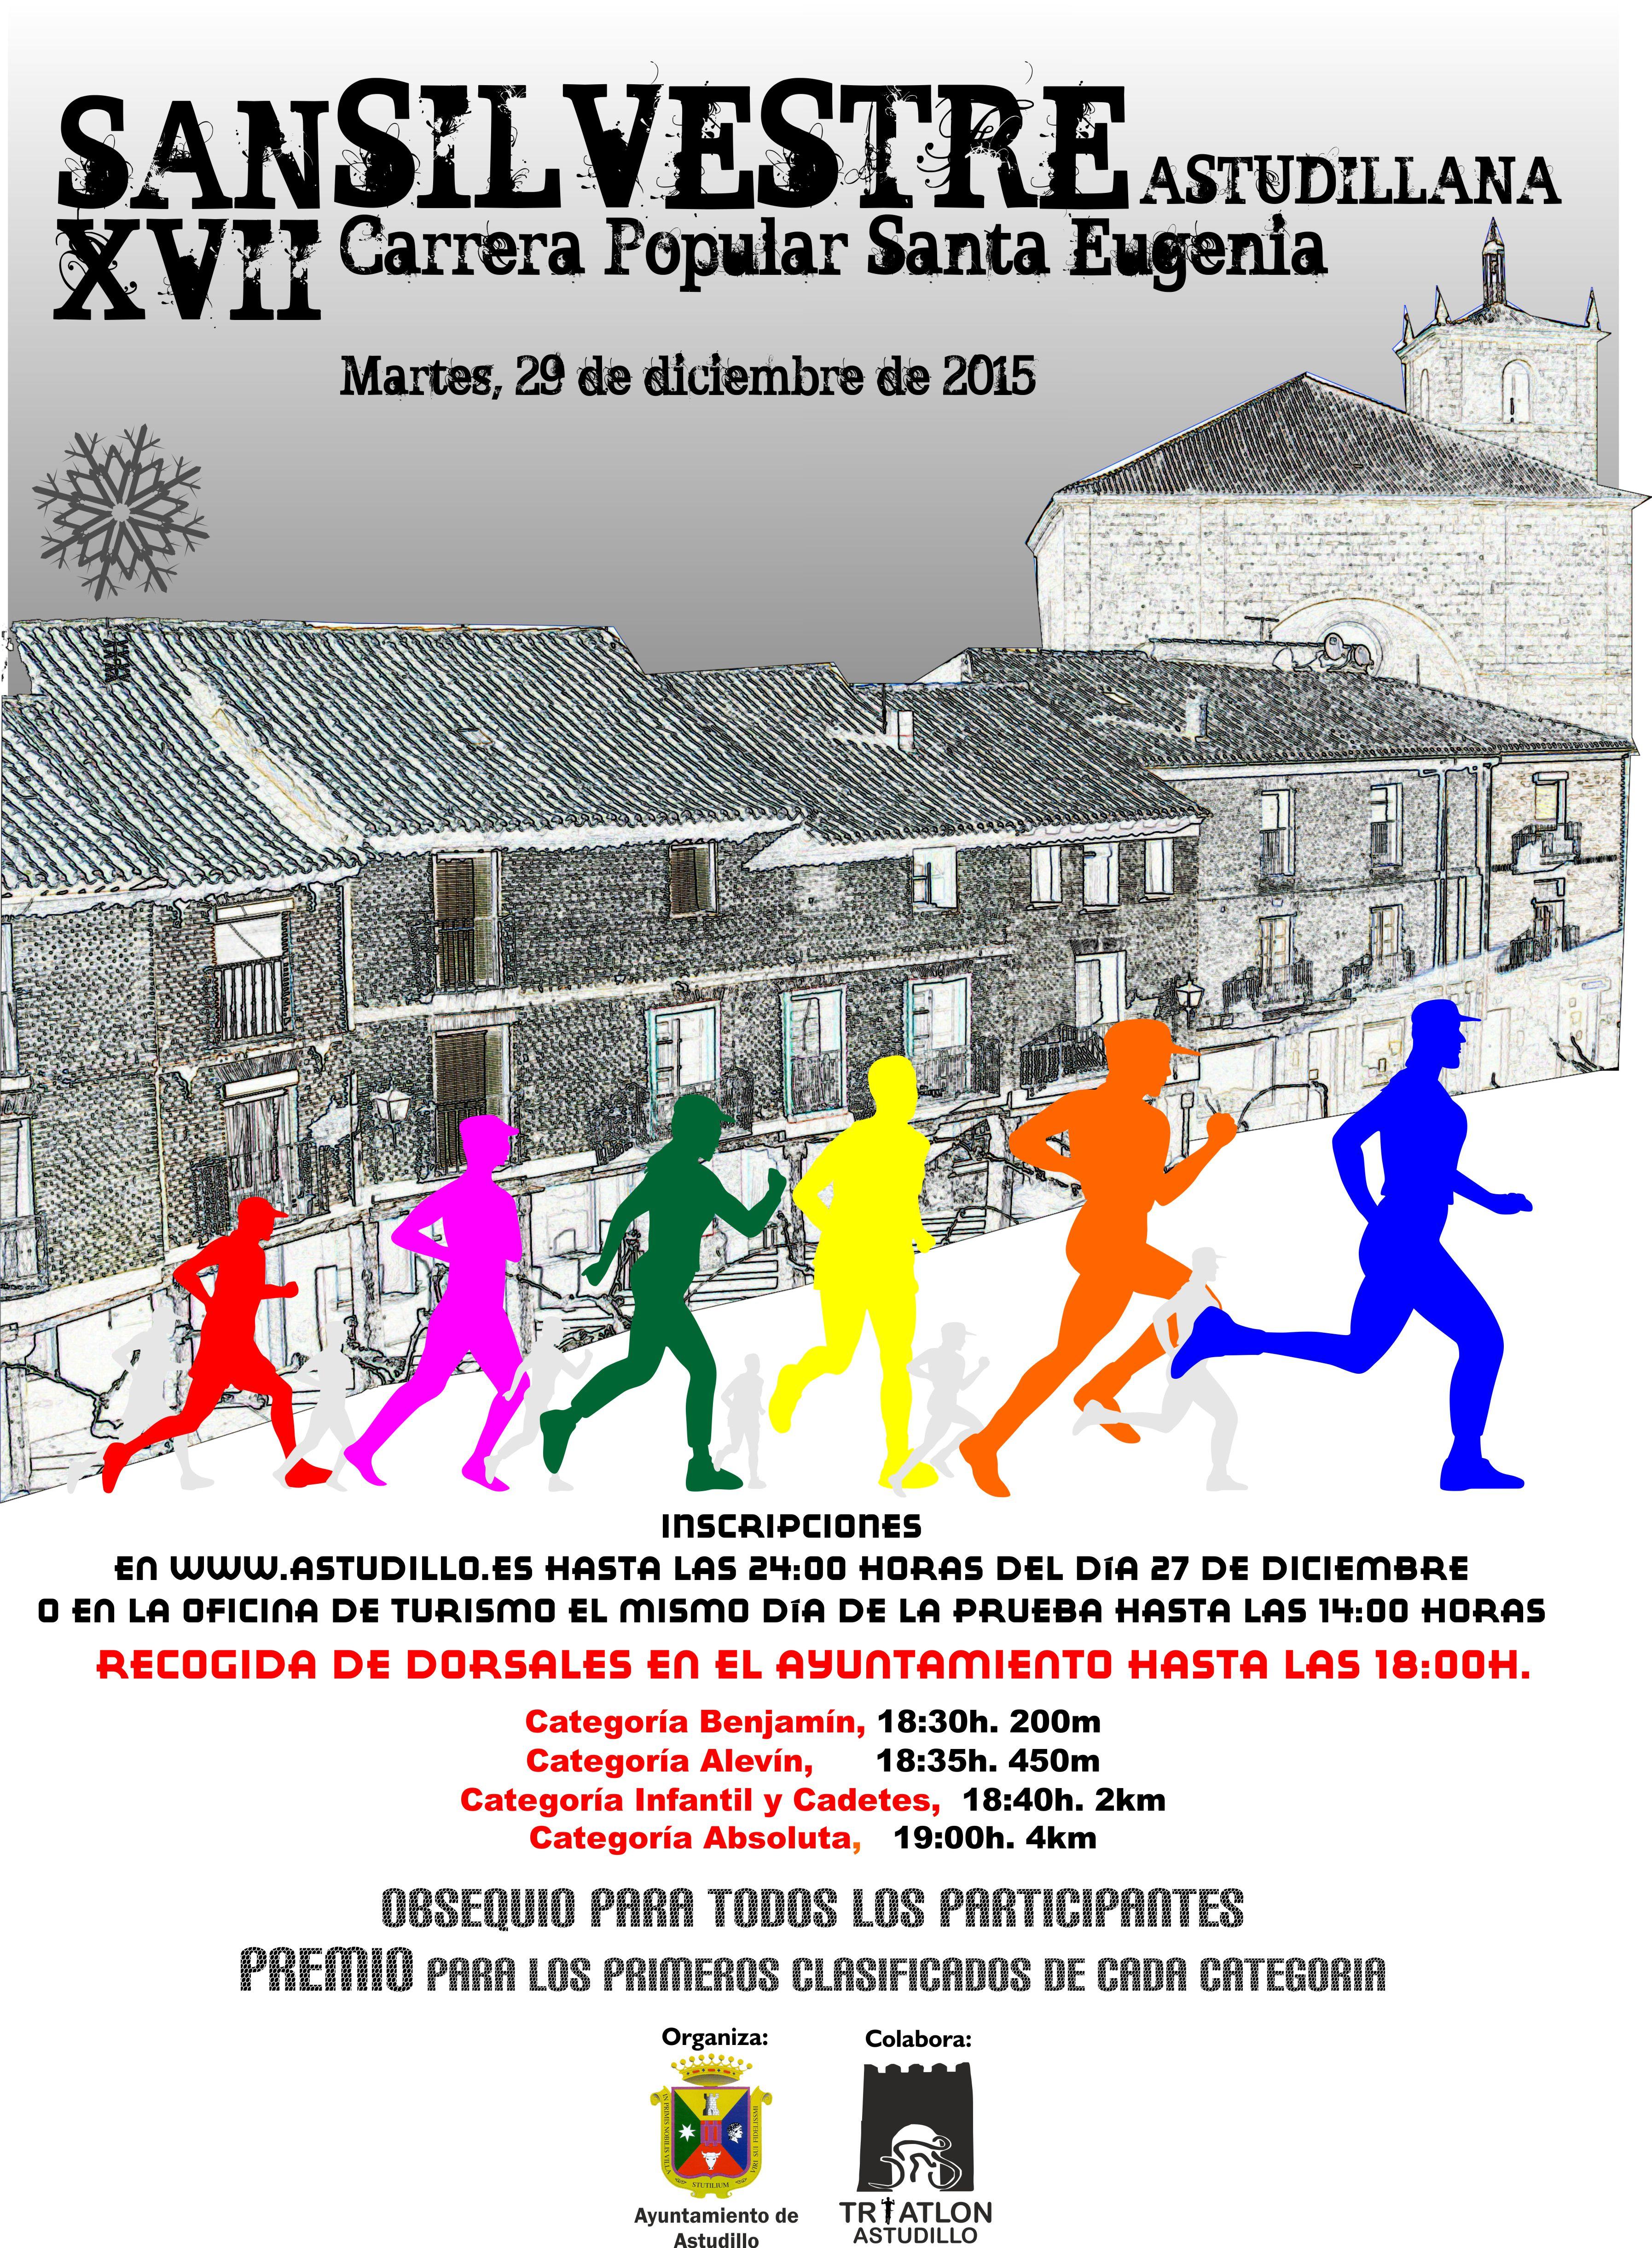 XVII San Silvestre Astudillana – Carrera Popular Santa Eugenia